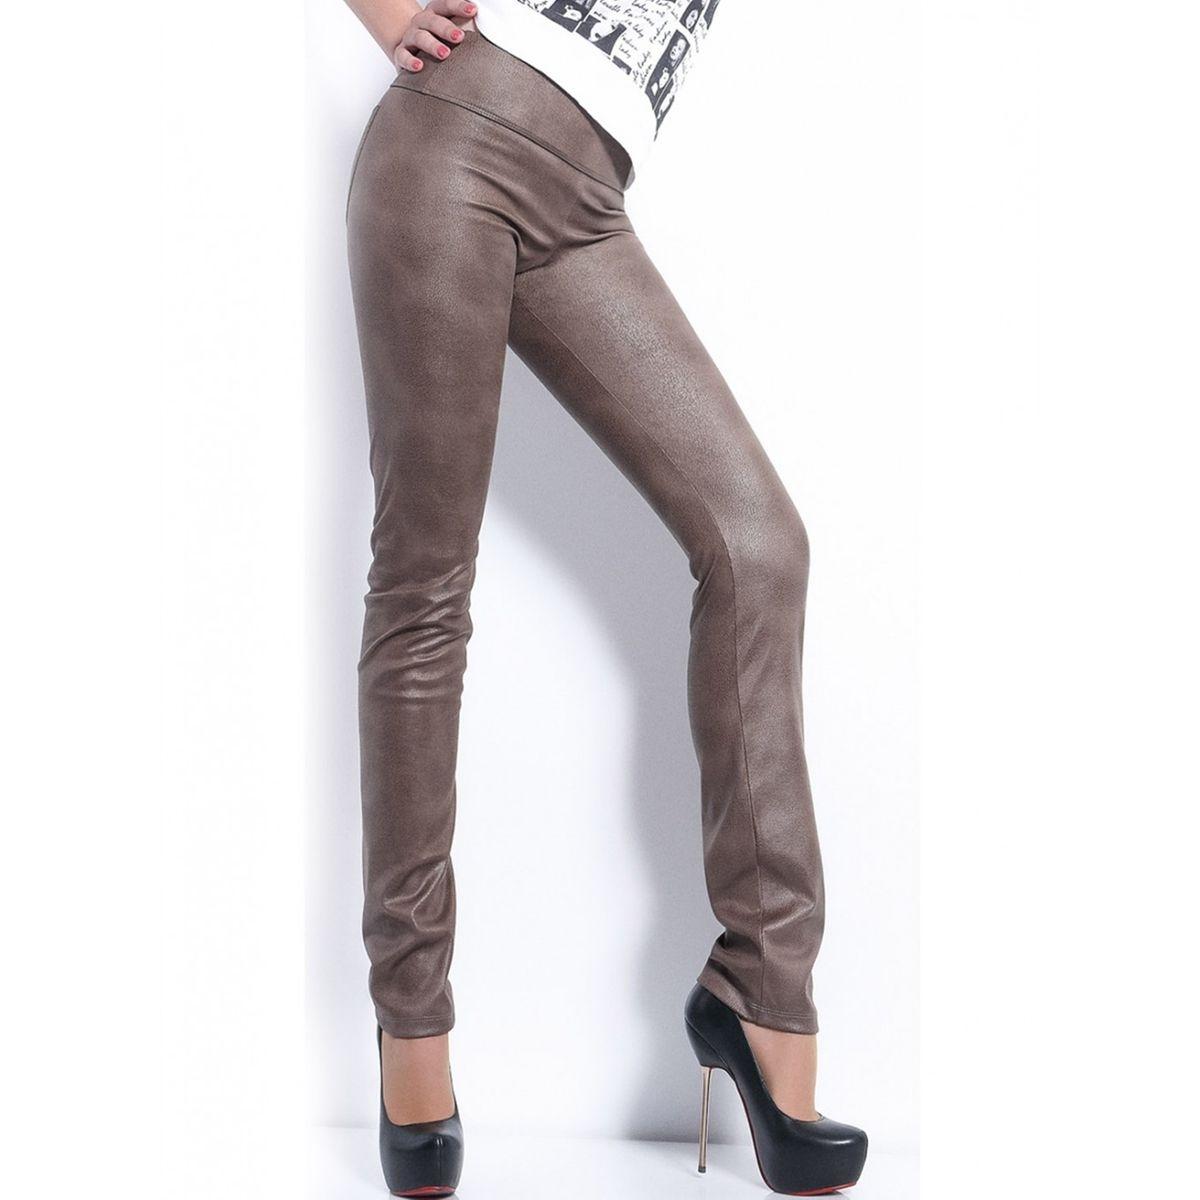 Legging Giulia modèle Leggy Skin 1